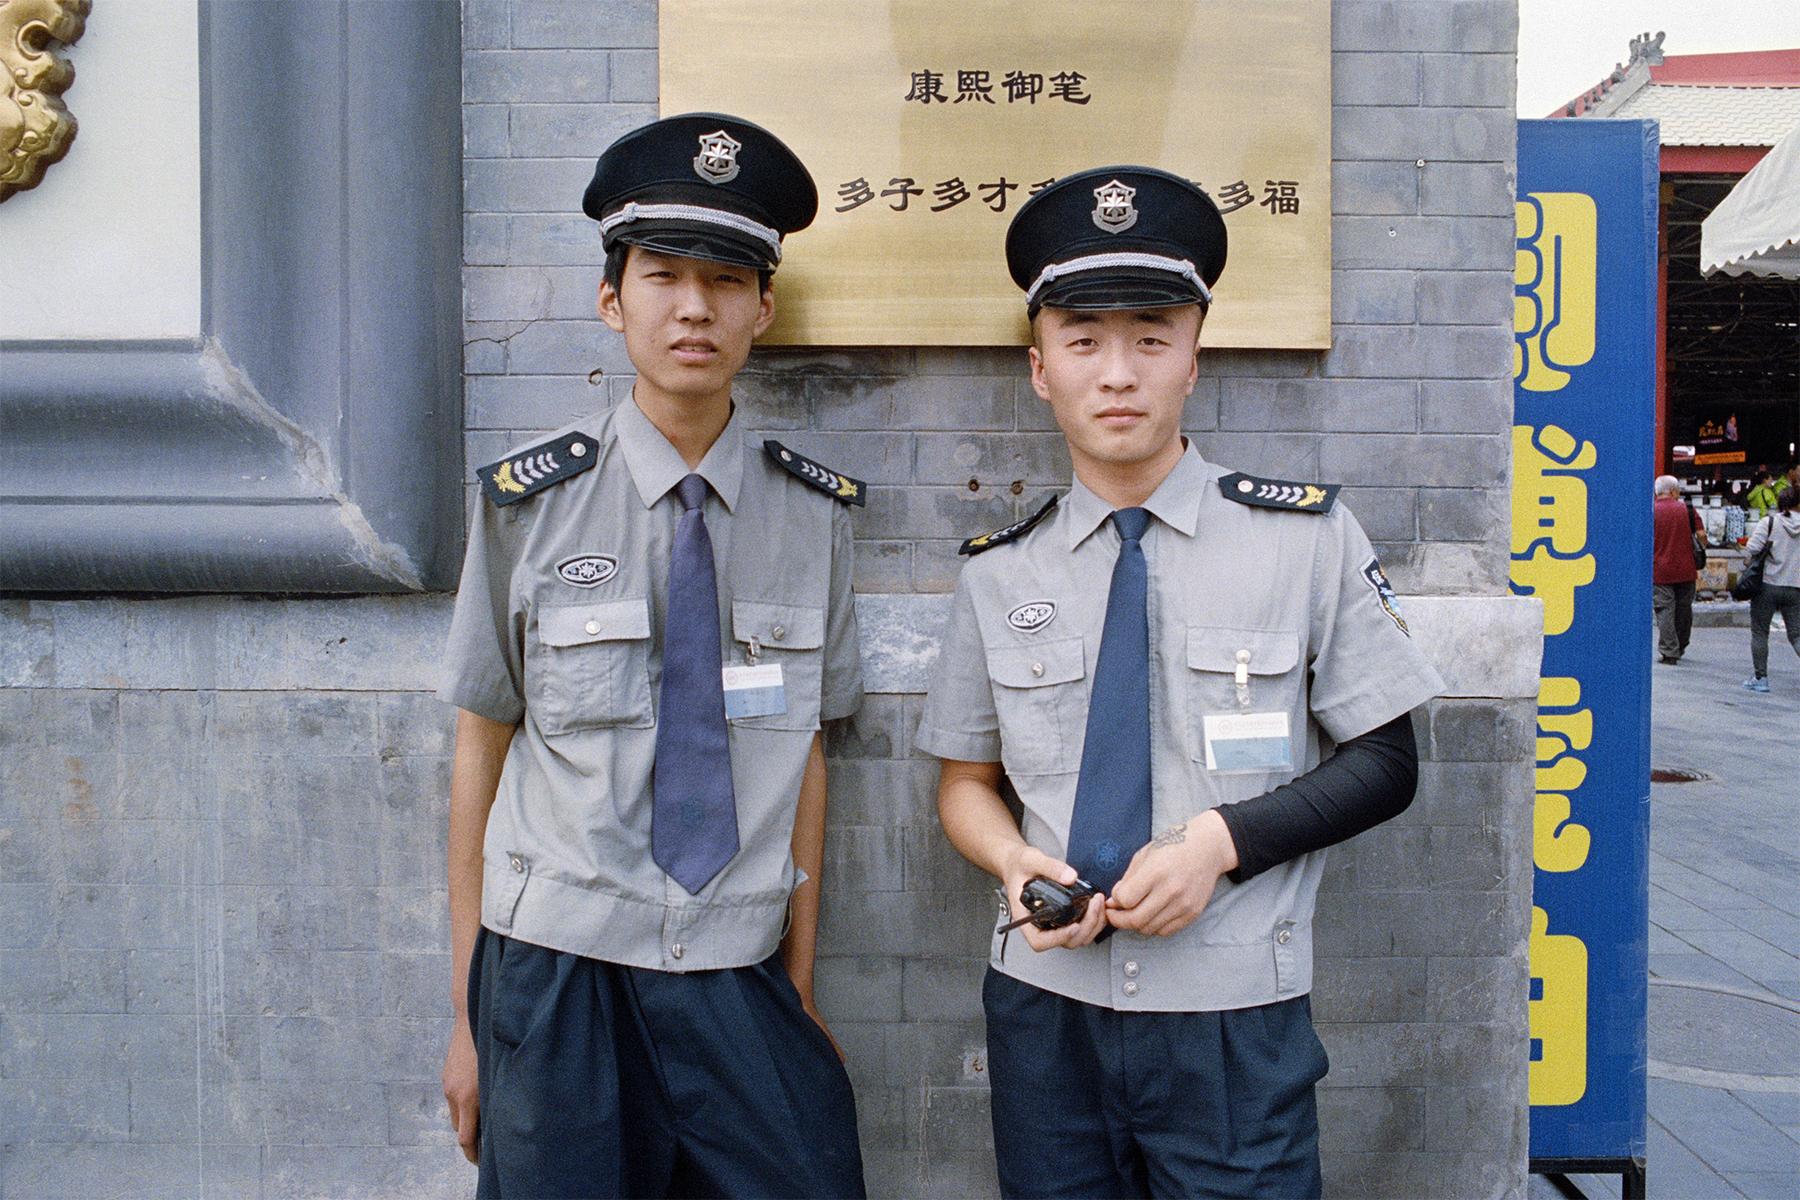 CHINA_1_web.jpg